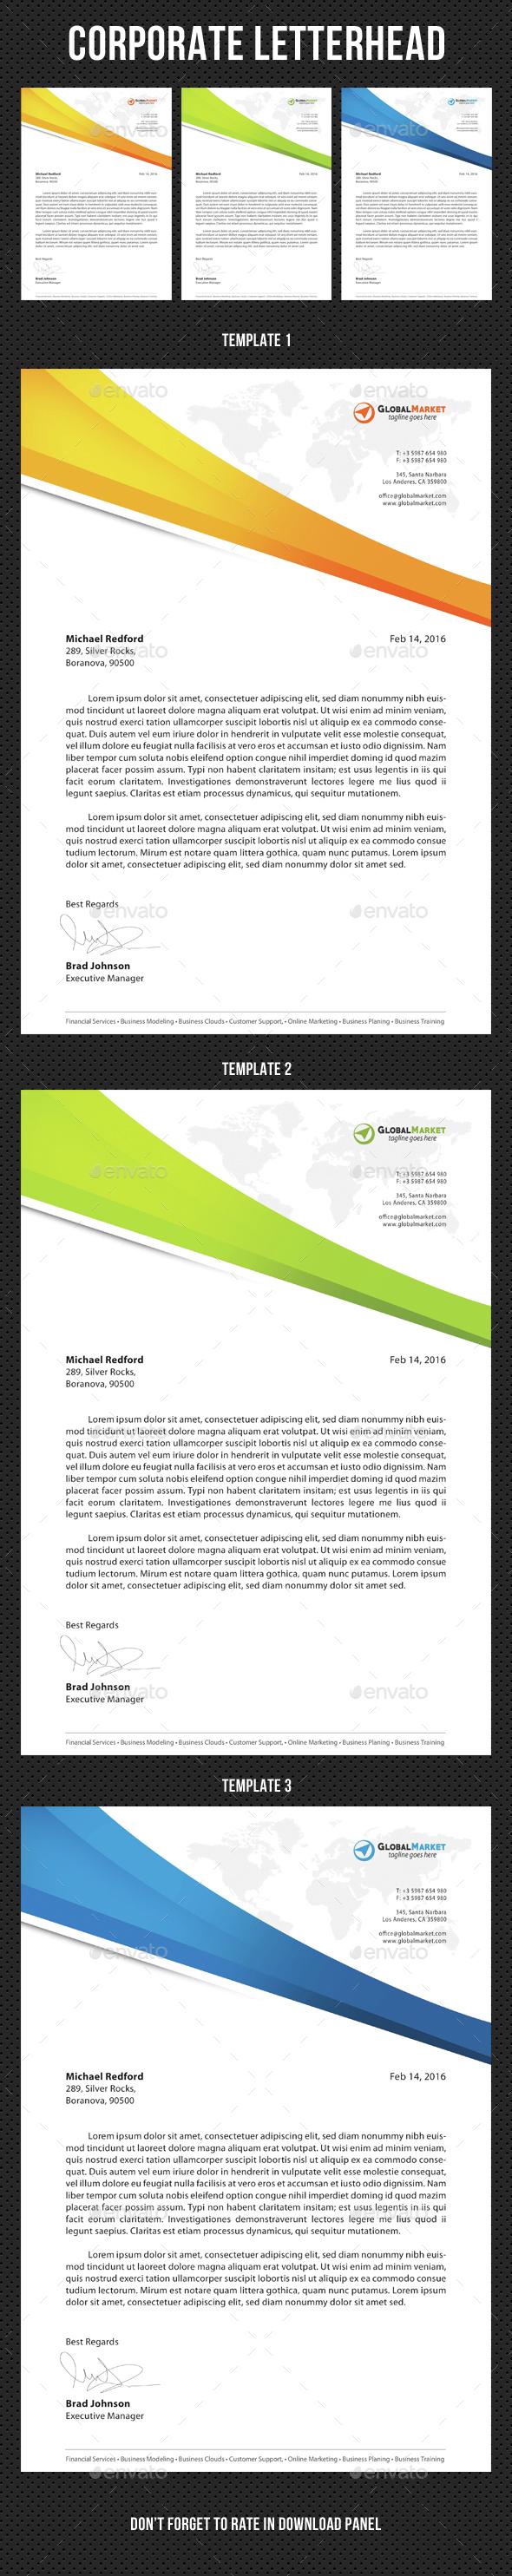 Corporate Letterhead v01 - Stationery Print Templates